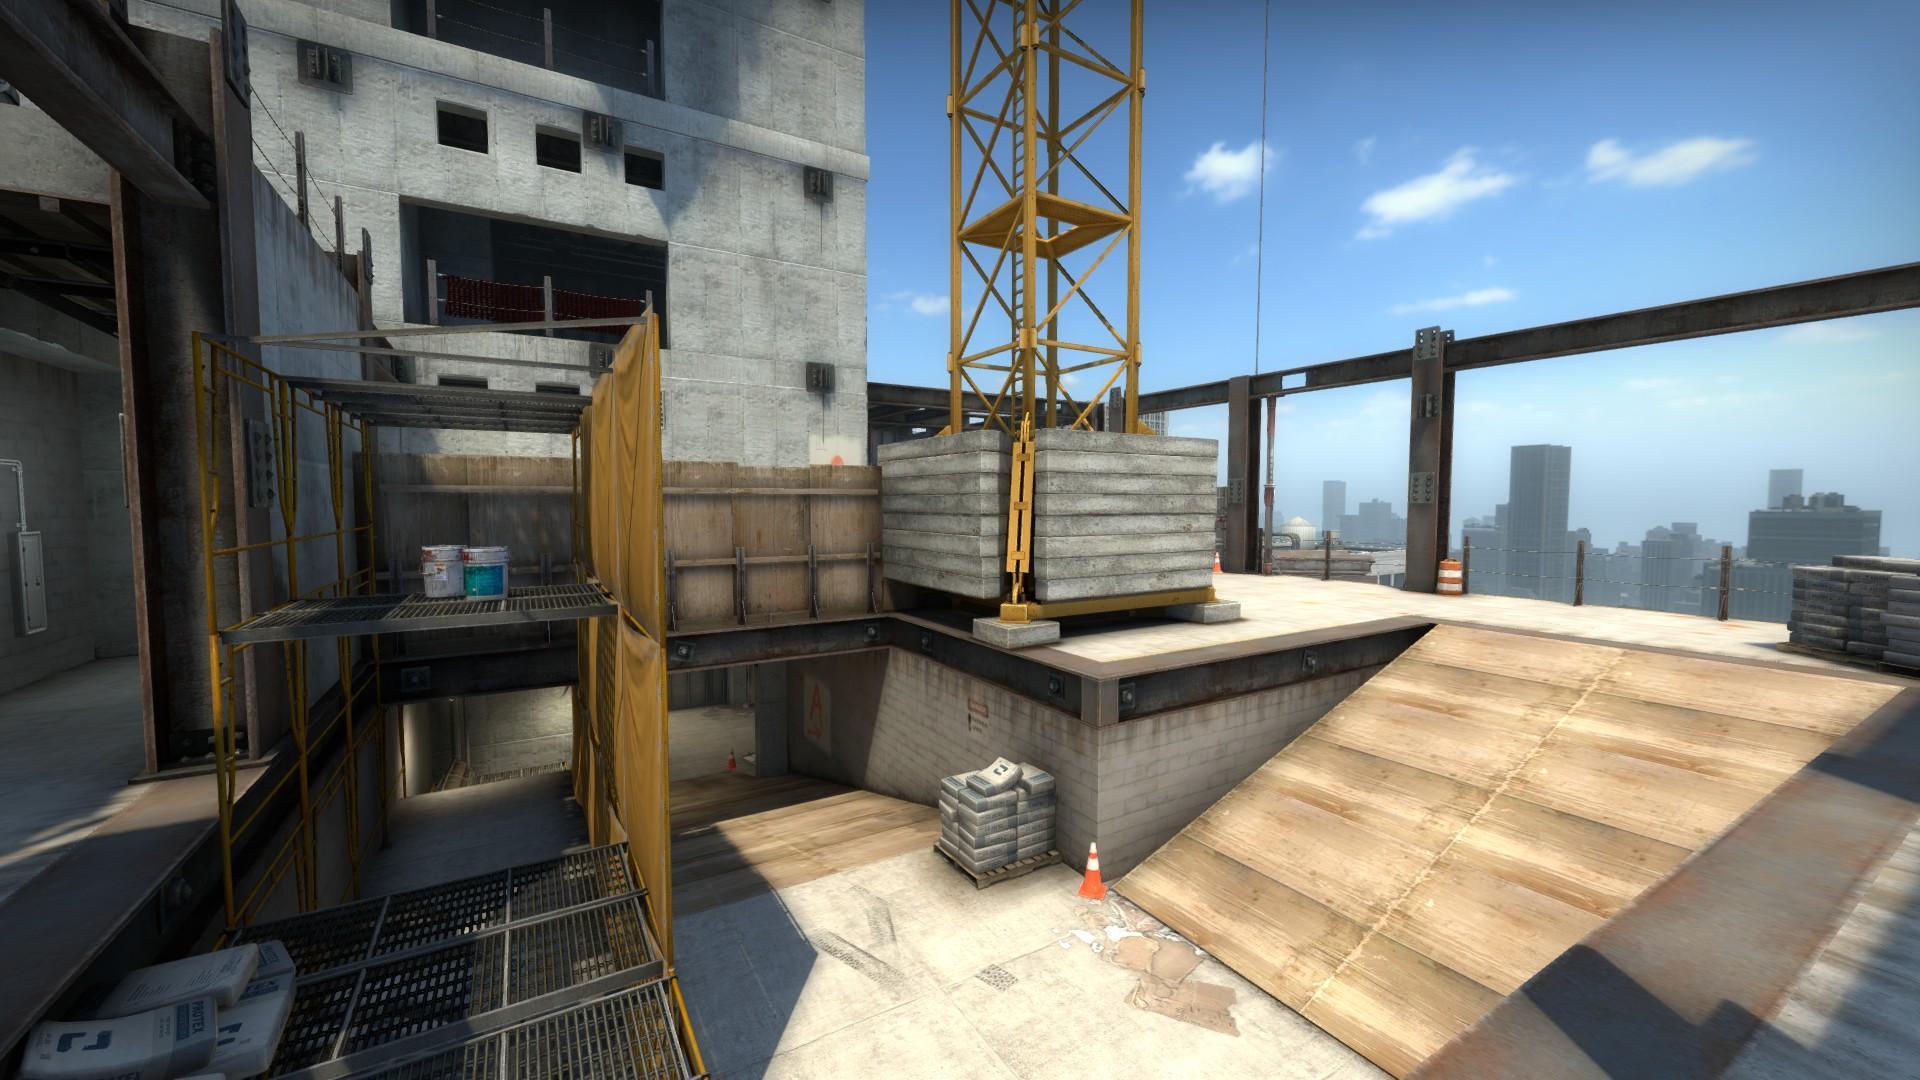 de_vertigo ramp